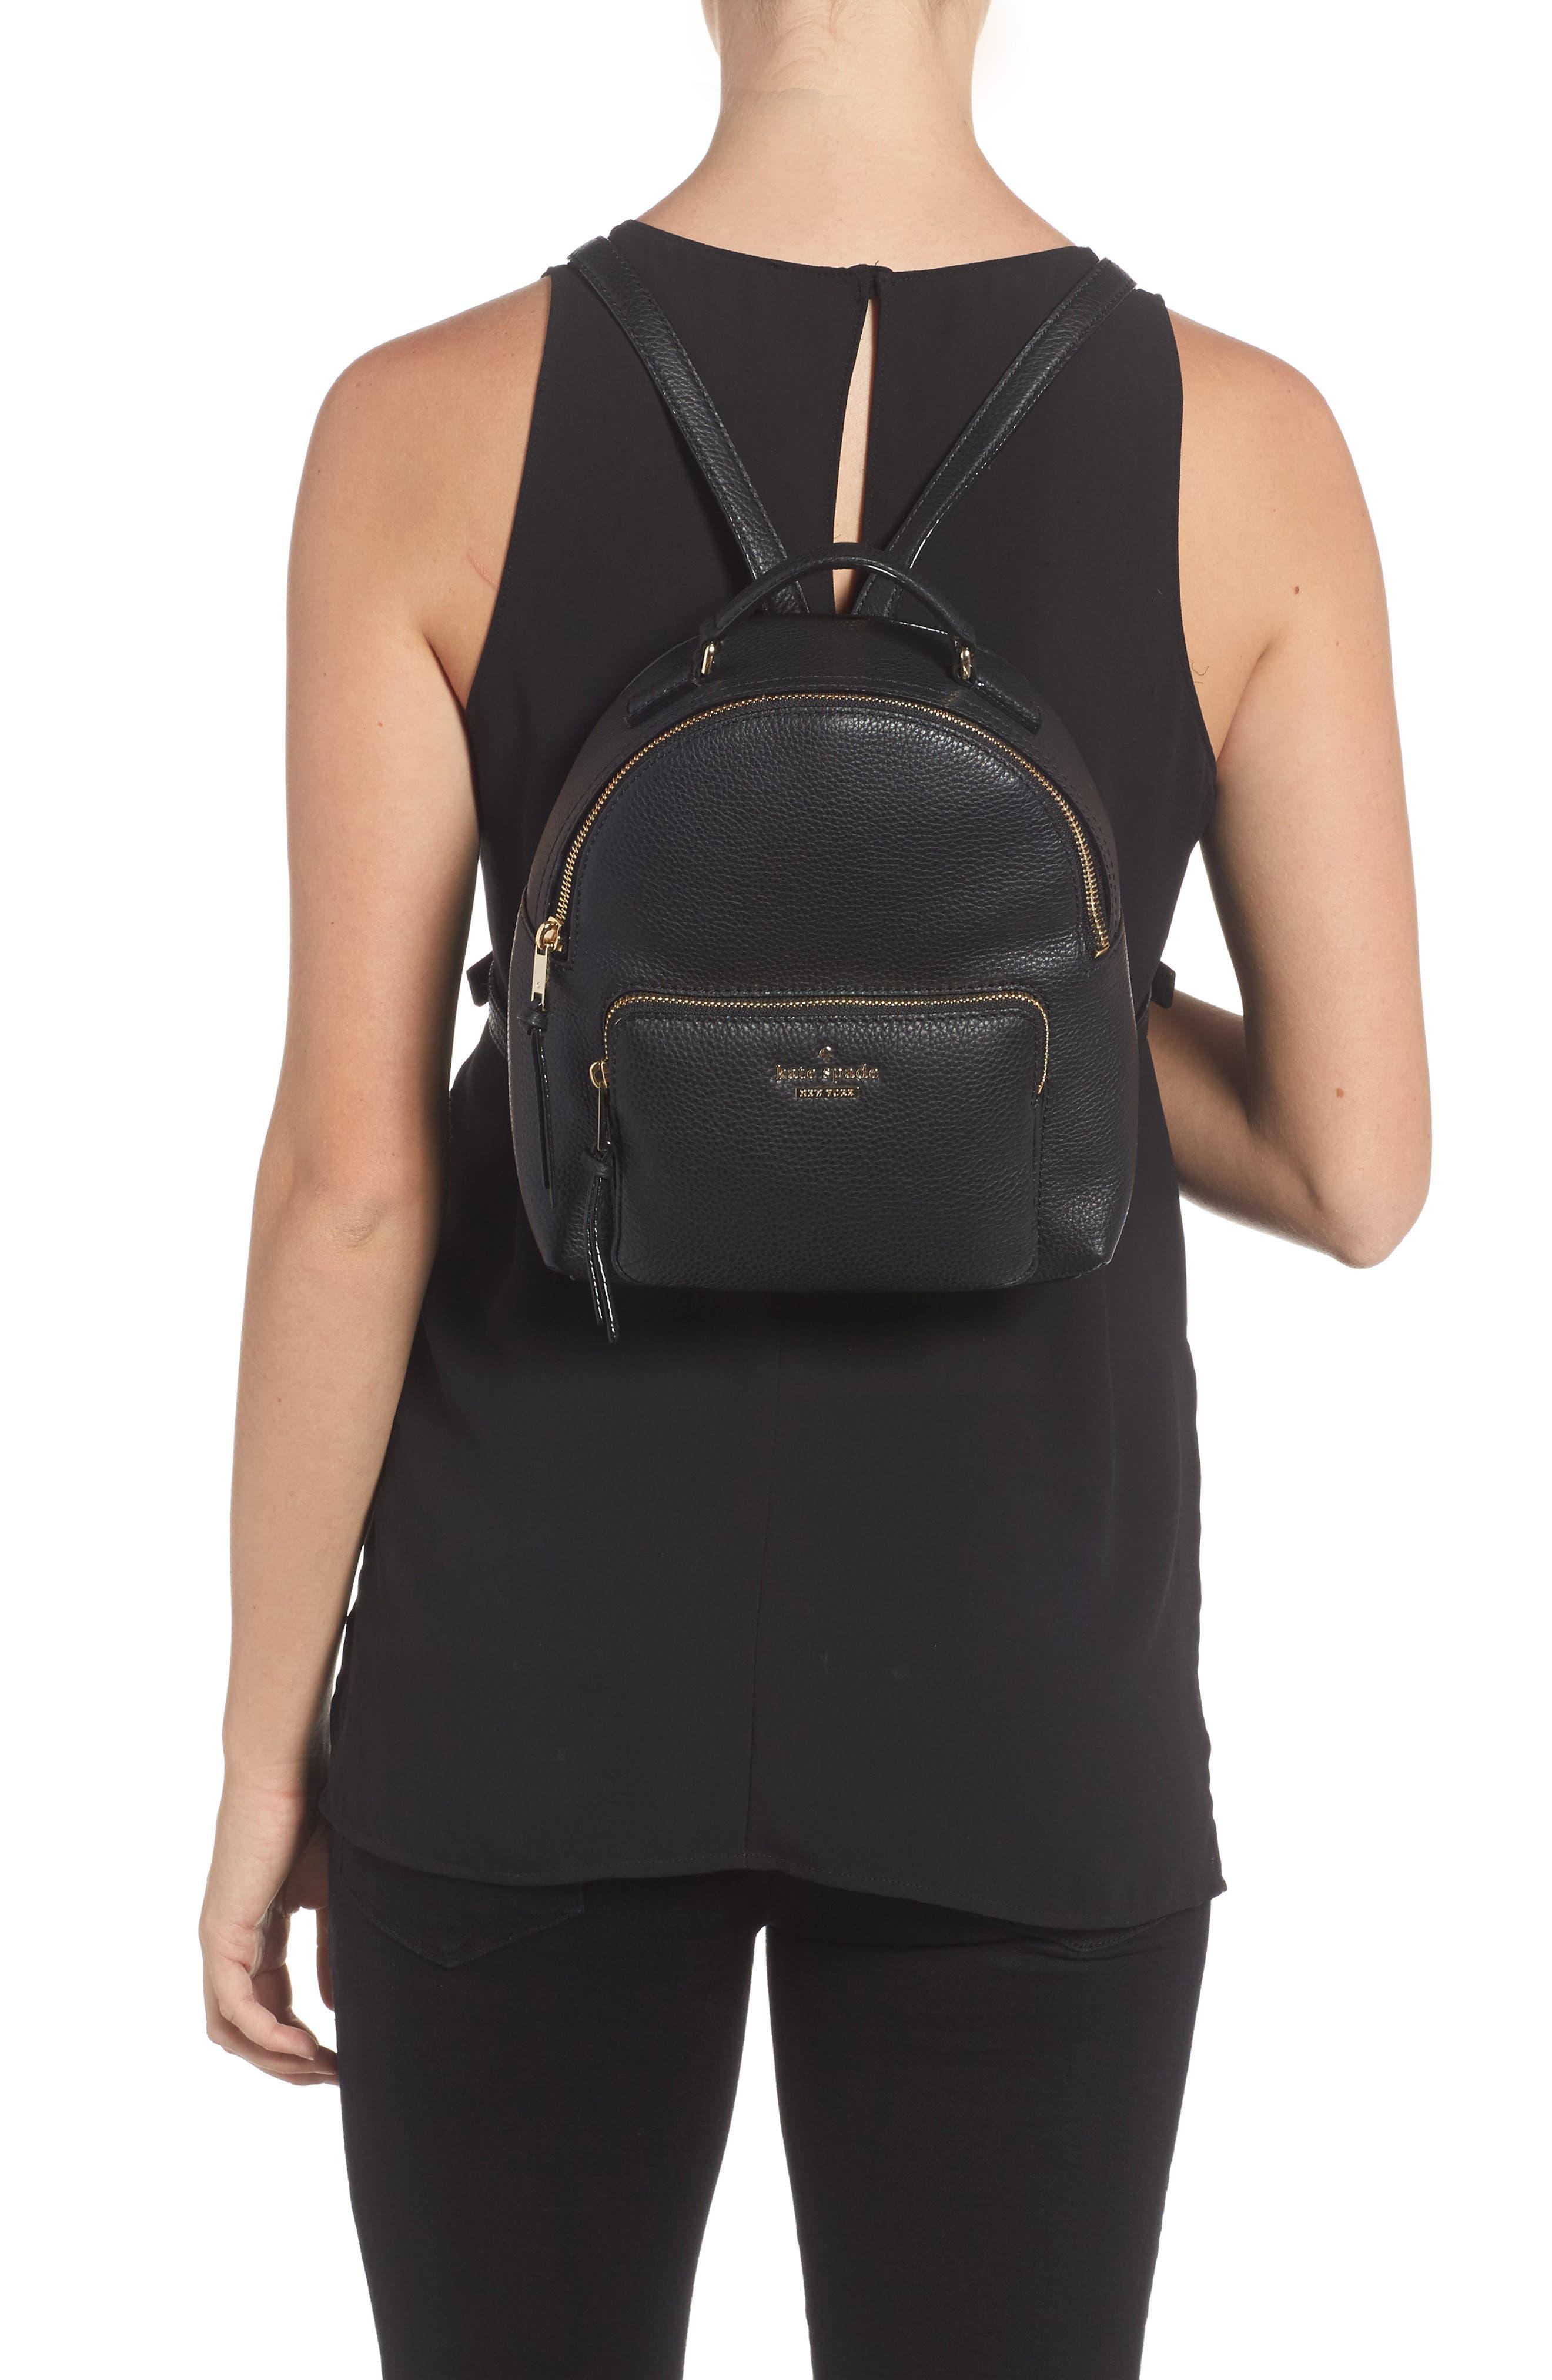 KATE SPADE NEW YORK,                             jackson street - keleigh leather backpack,                             Alternate thumbnail 2, color,                             BLACK